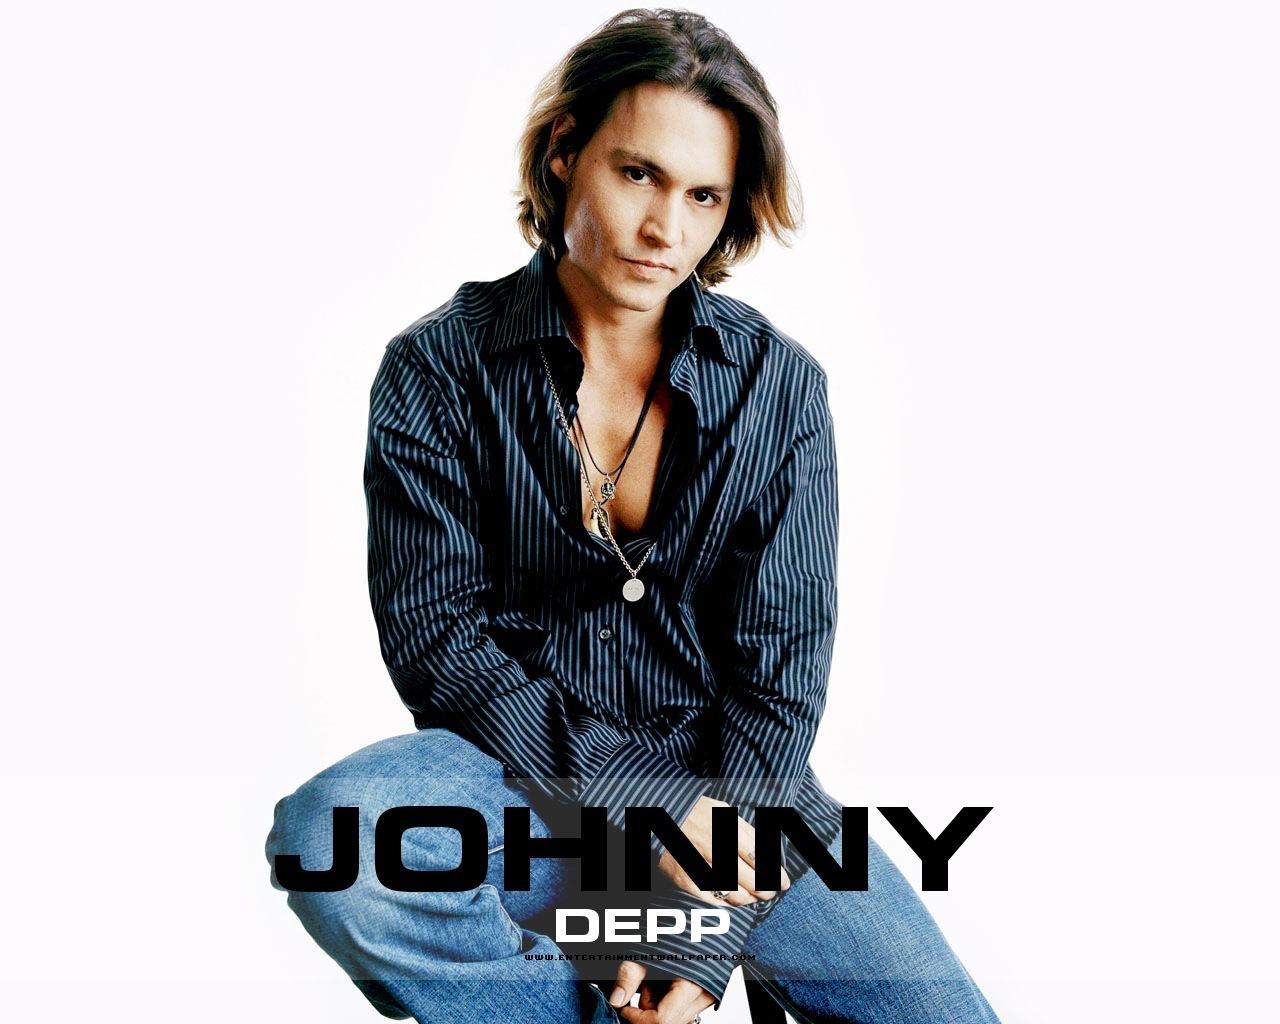 http://4.bp.blogspot.com/_CRaThmJ8BCs/THEqIqBWVsI/AAAAAAAAADc/-F0nlDAwVRA/s1600/-Johnny-johnny-depp-6466321-1280-1024.jpg